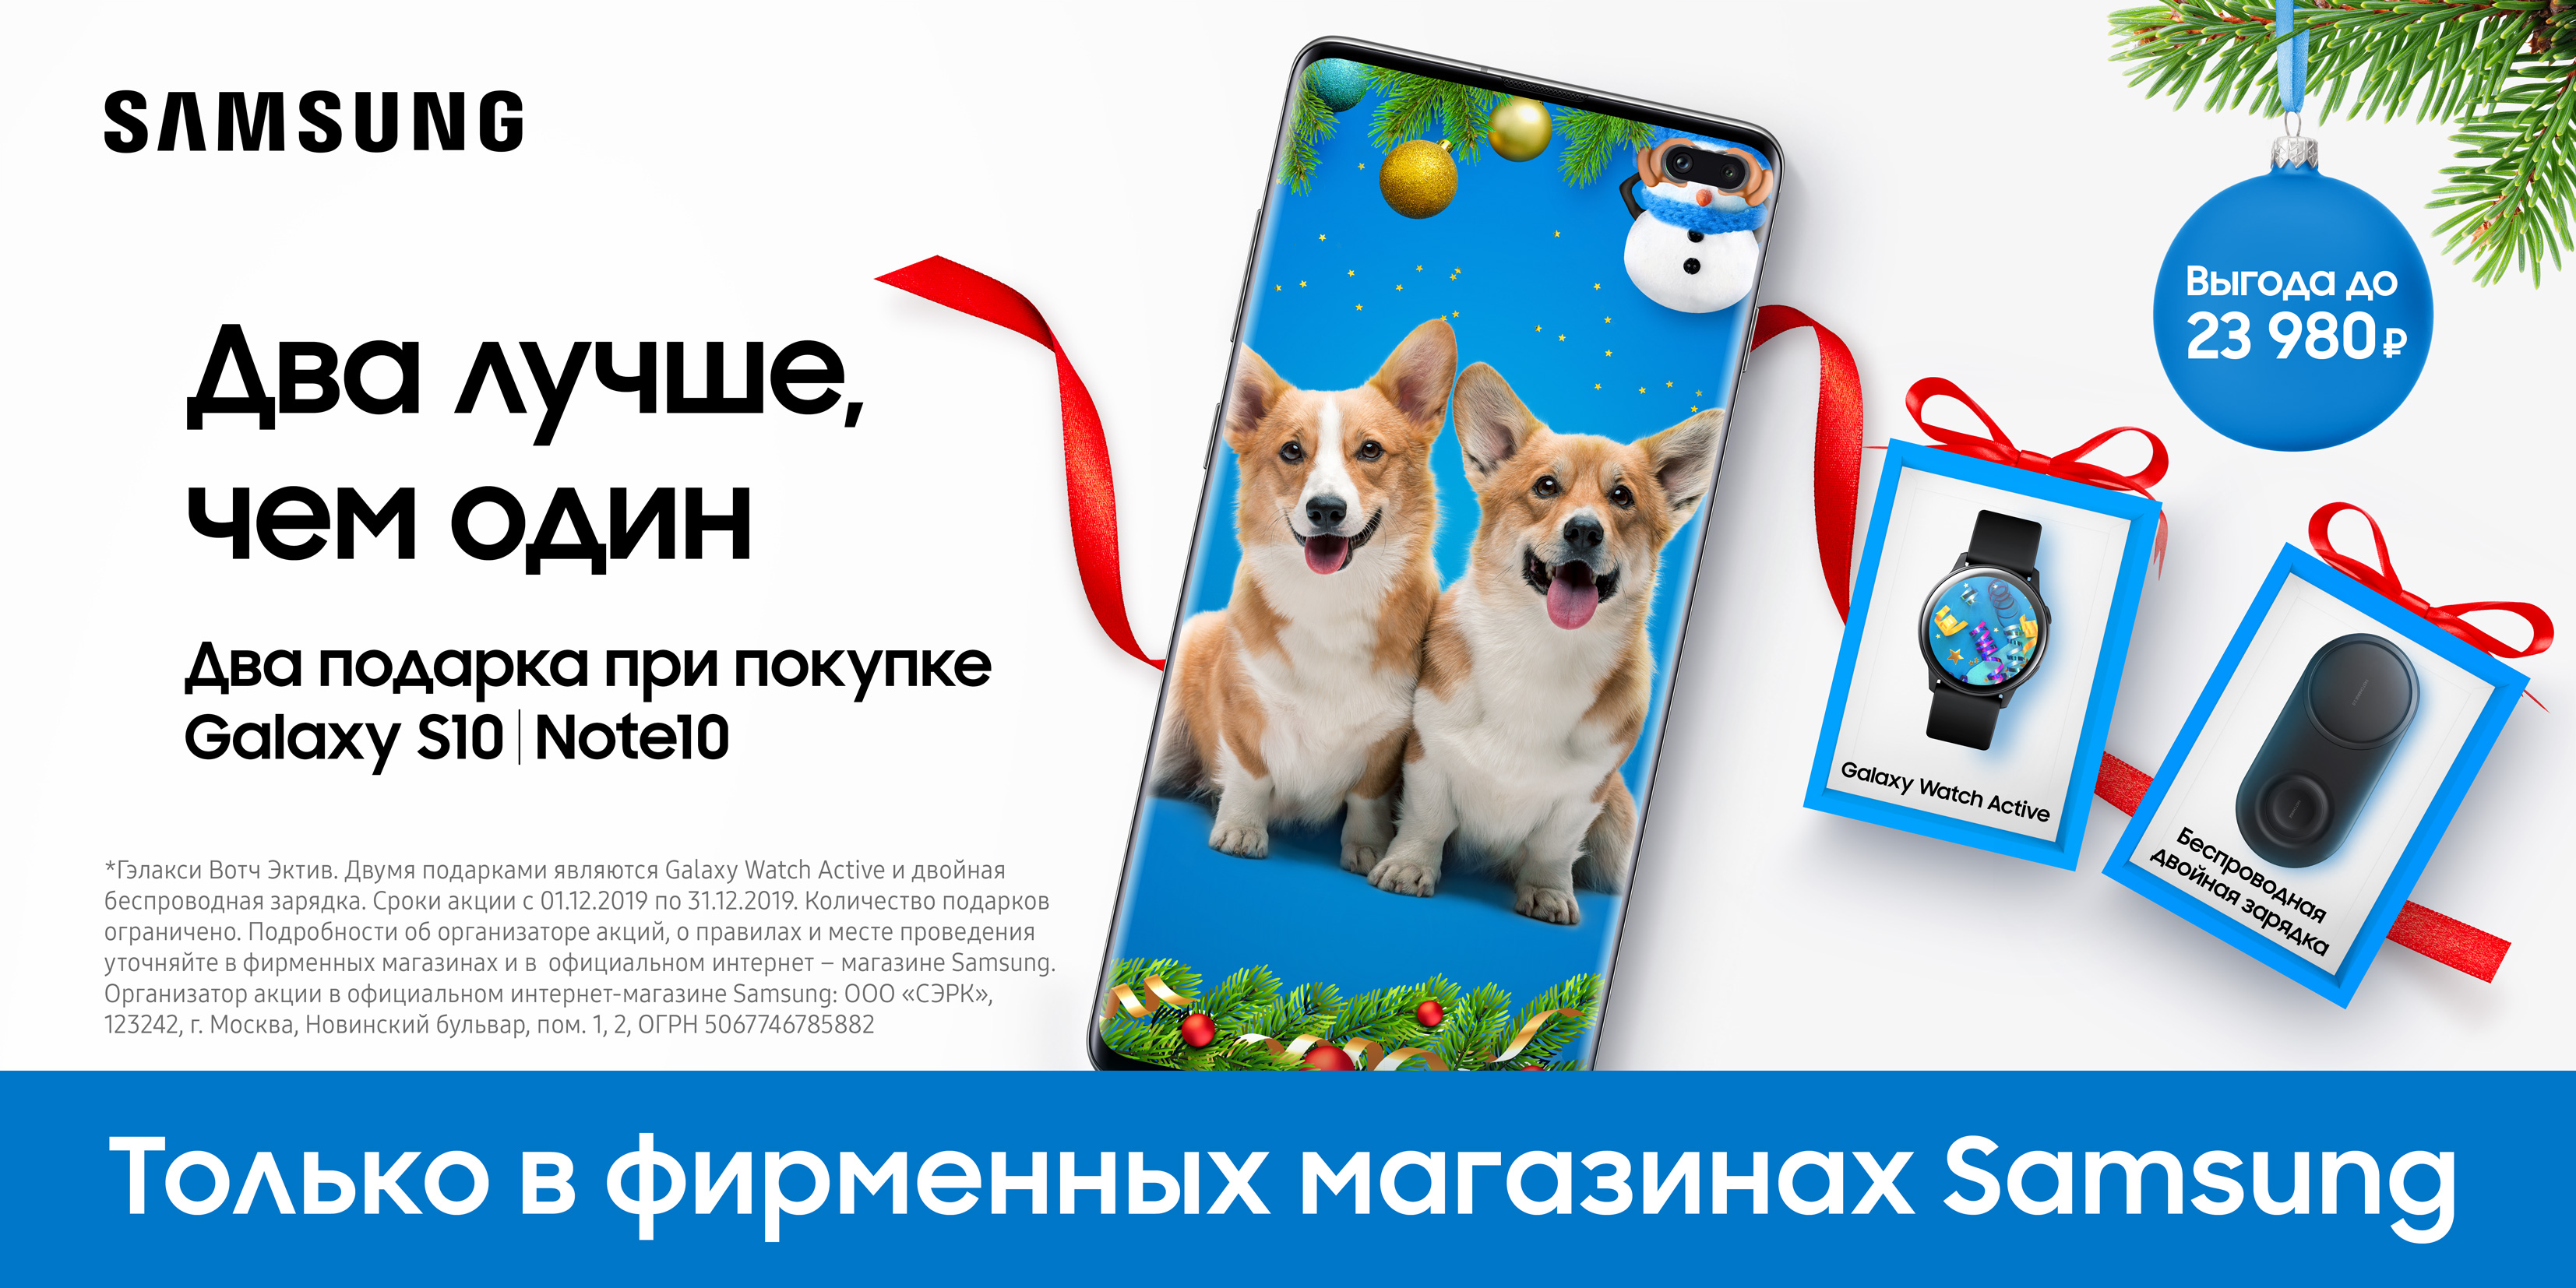 Купи Samsung Galaxy S10 / Note10 и получи два подарка